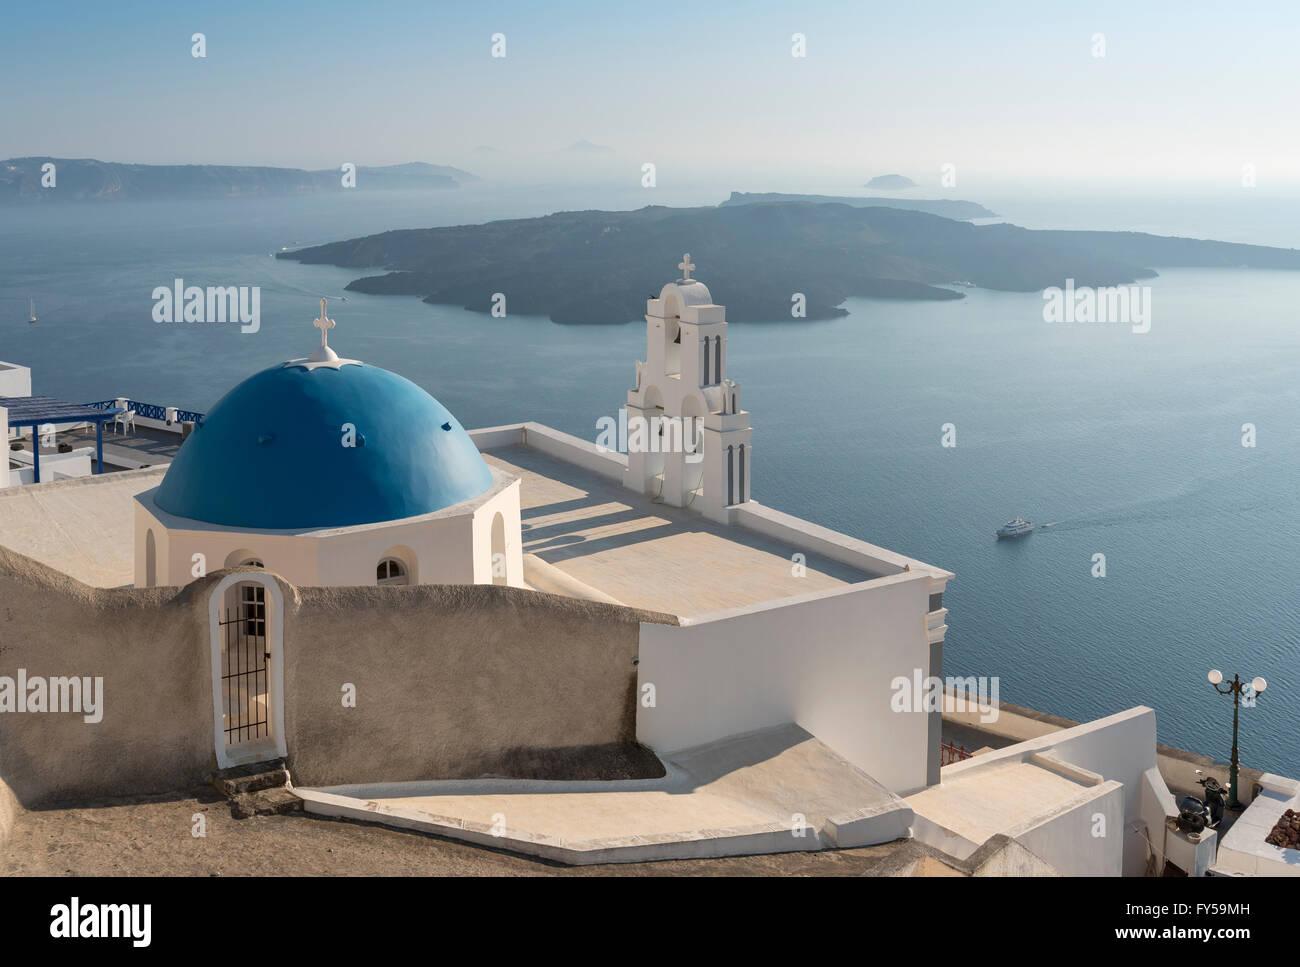 Blue dome and bell-tower of Firostefani Church, Santorini, Greece Stock Photo